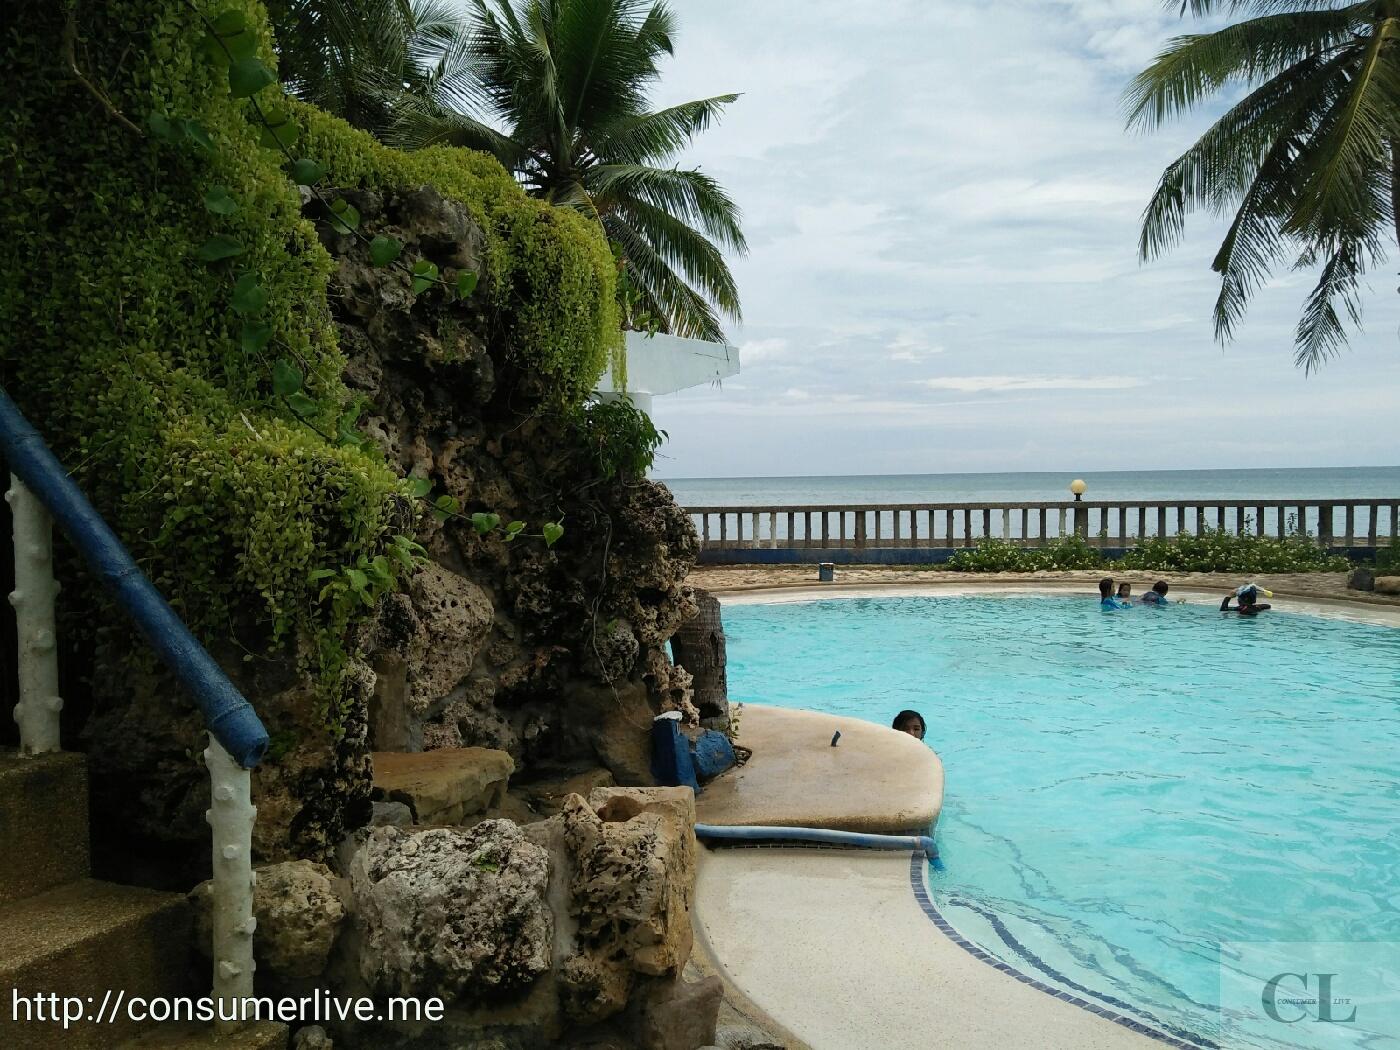 In Pictures: Estaca Bay Gardens Resort (Compostela, Cebu)